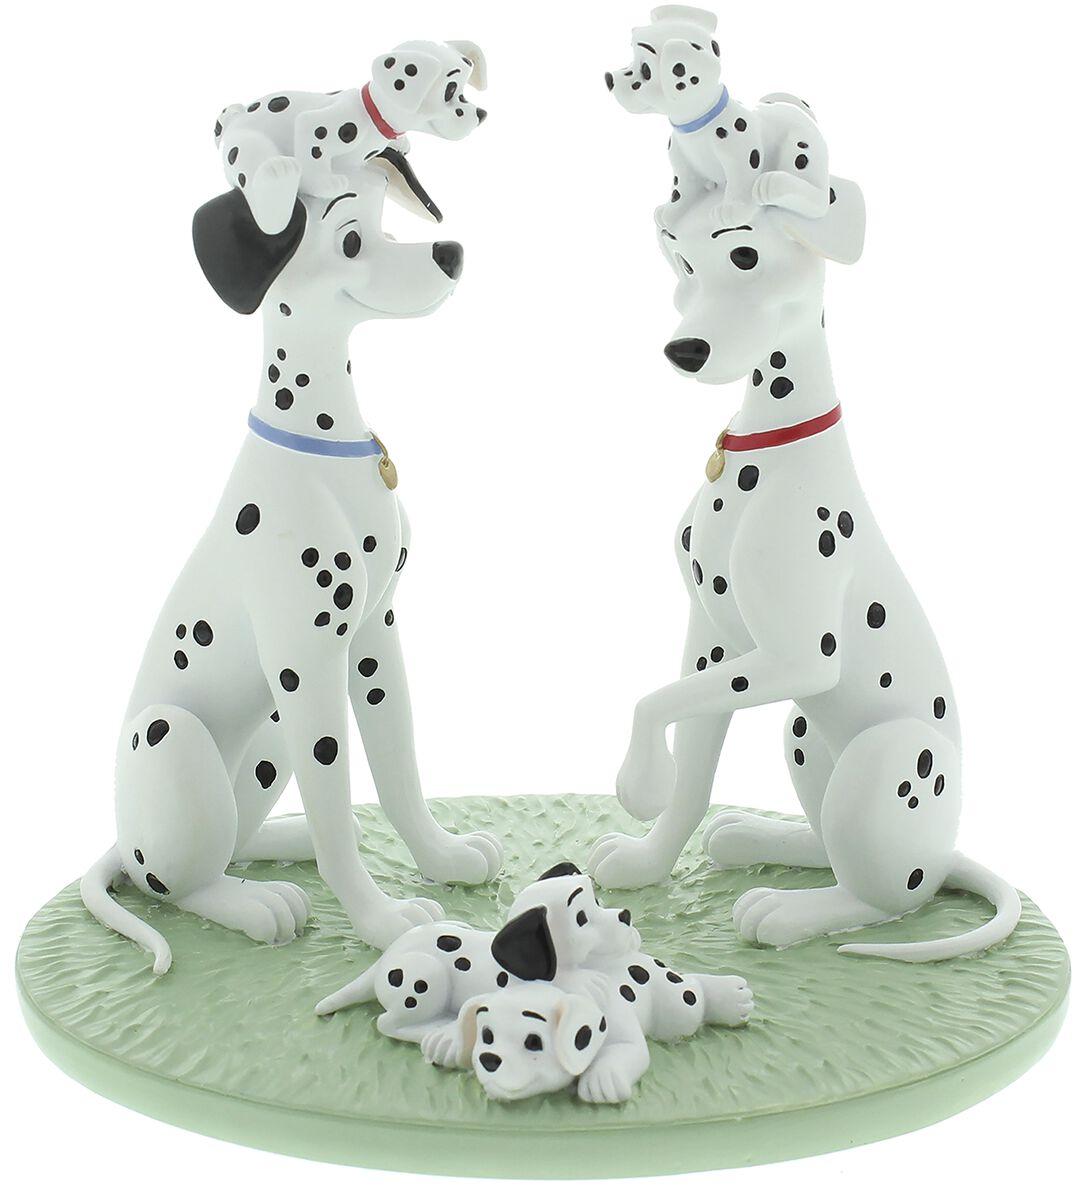 Image of 101 Dalmatiner Dalmatiner Familie Statue Standard